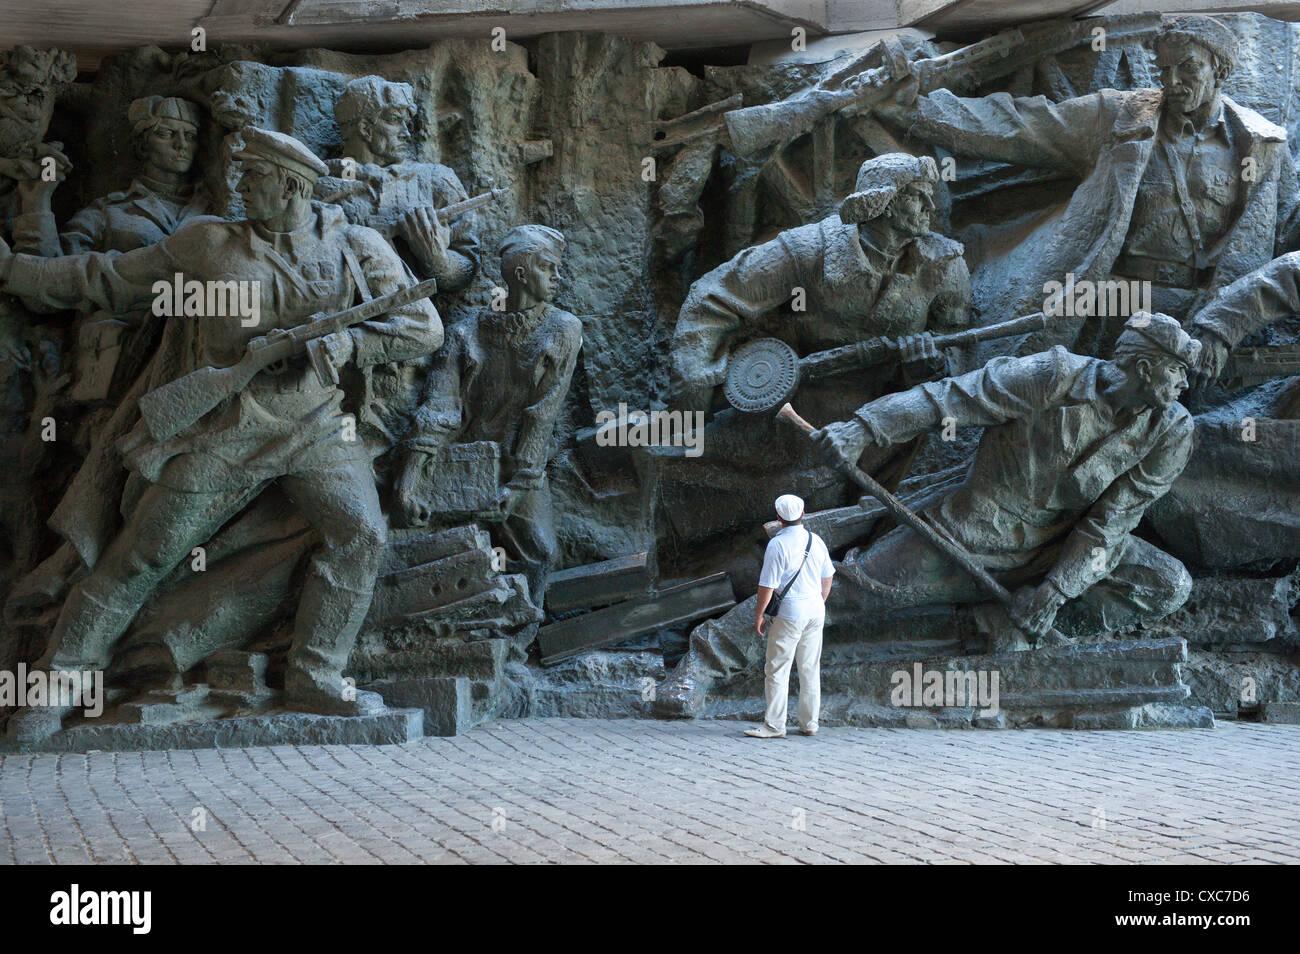 Sculpture, National Museum of the History of the Great Patriotic War 1941-1945, Kiev, Ukraine, Europe - Stock Image